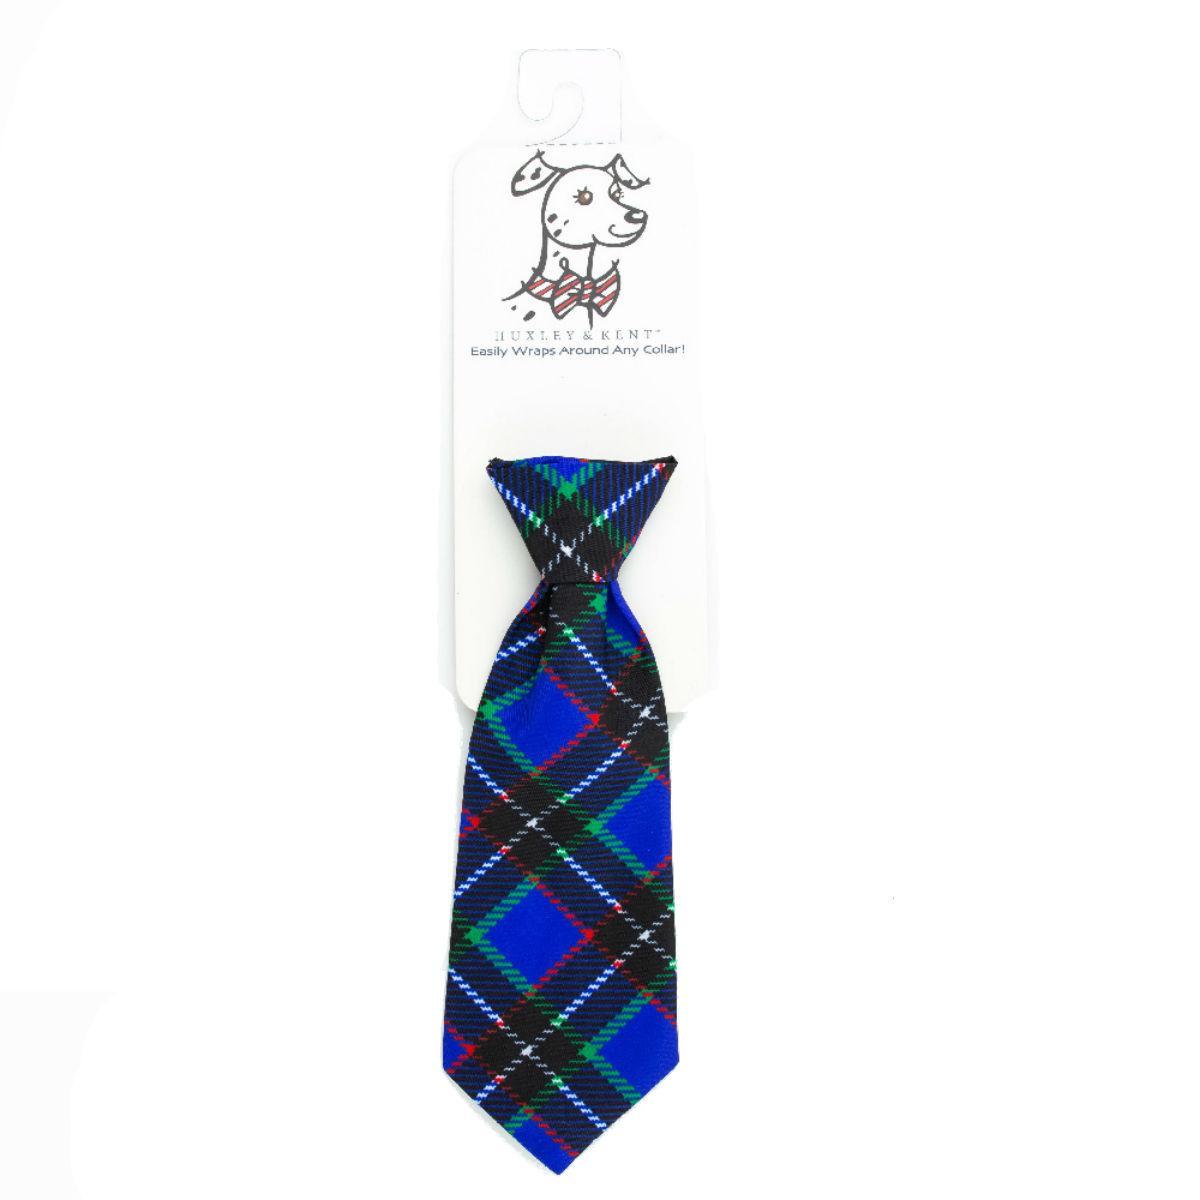 Huxley & Kent Long Tie Collar Attachment Dog Necktie - Blueberry Plaid